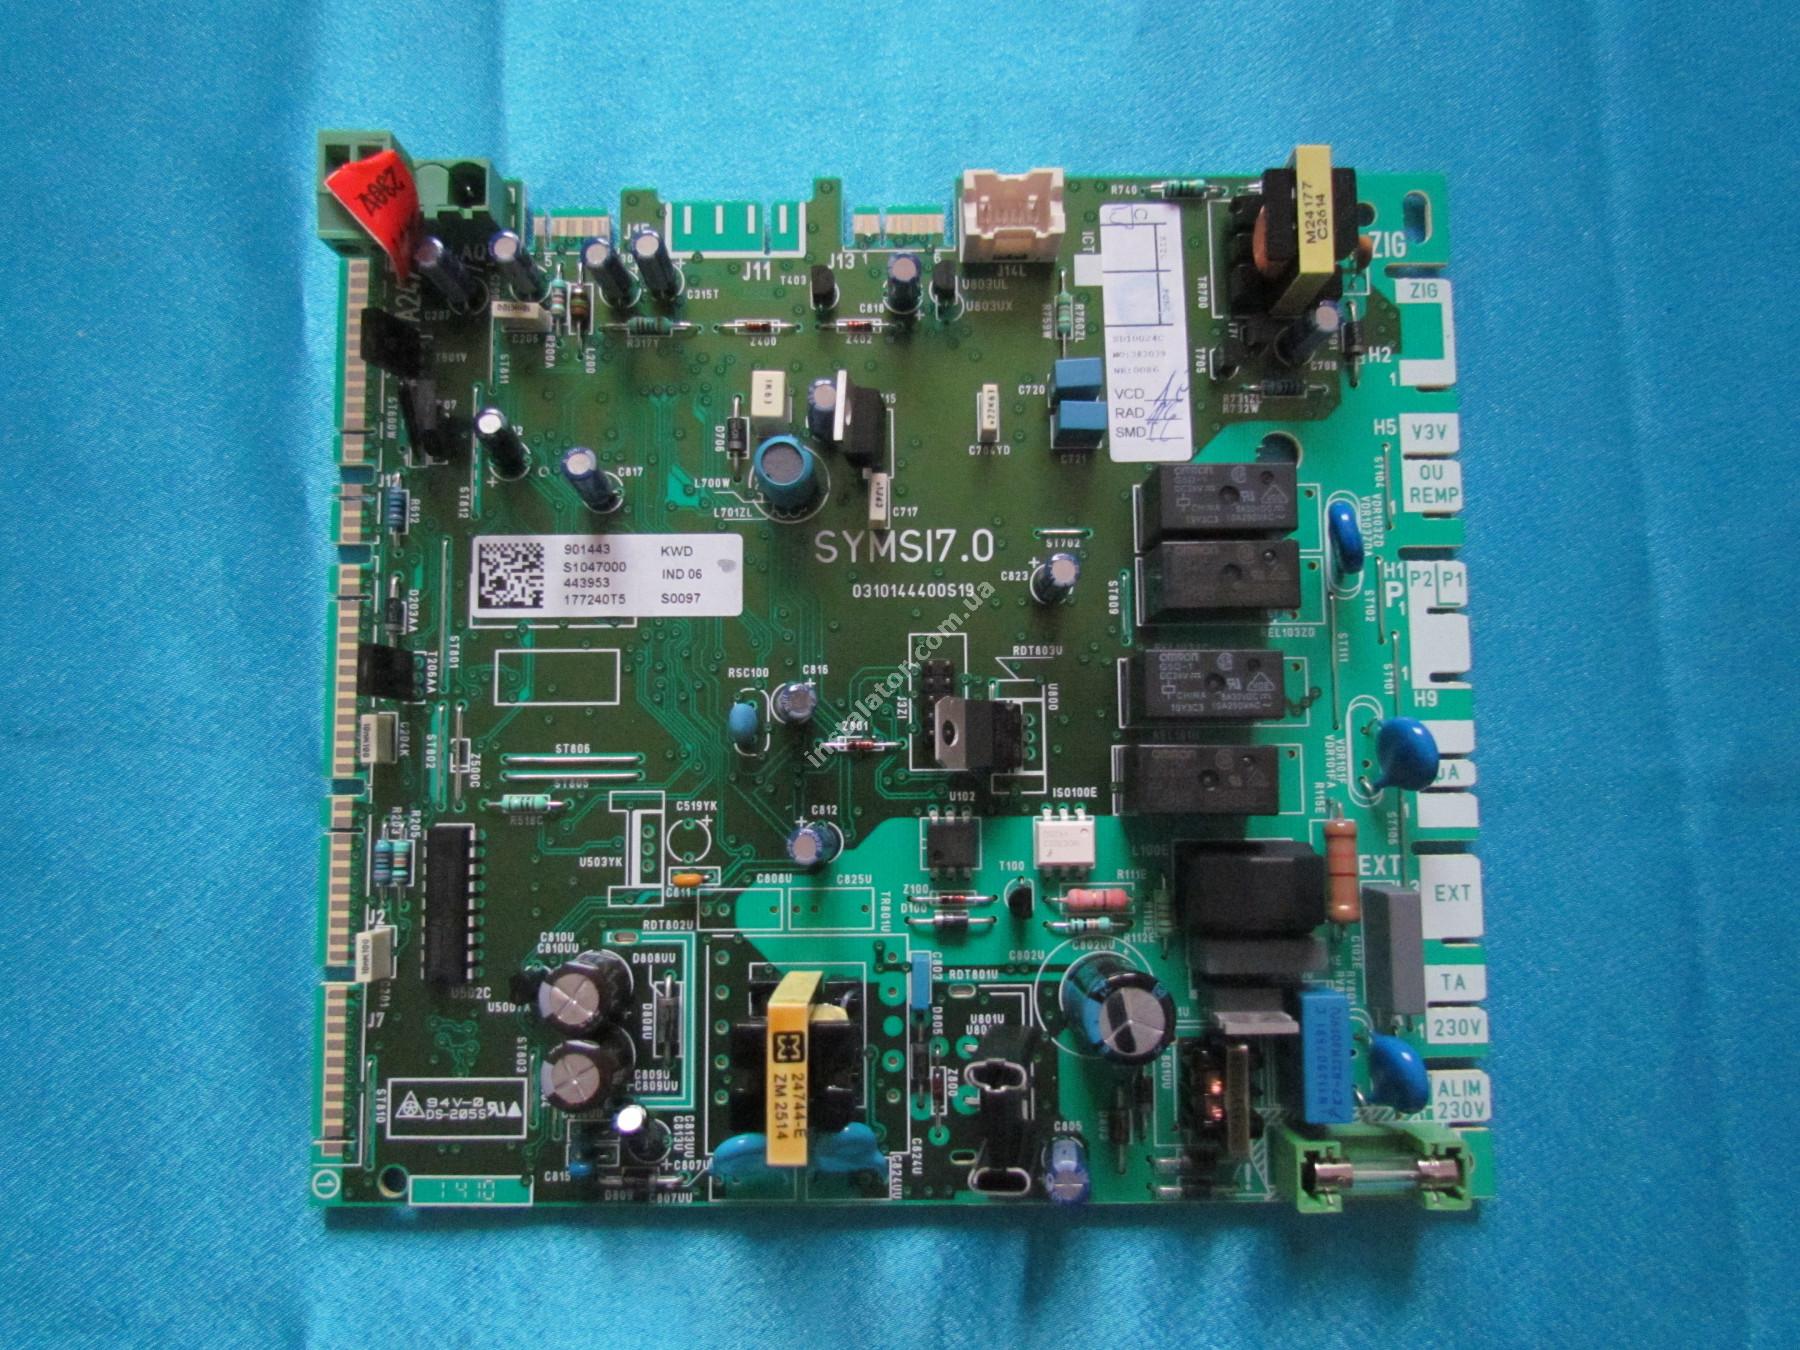 S1047000 Плата керування (основна) SAUNIER DUVAL ThemaClassic, Isofast, Combitek full-image-1